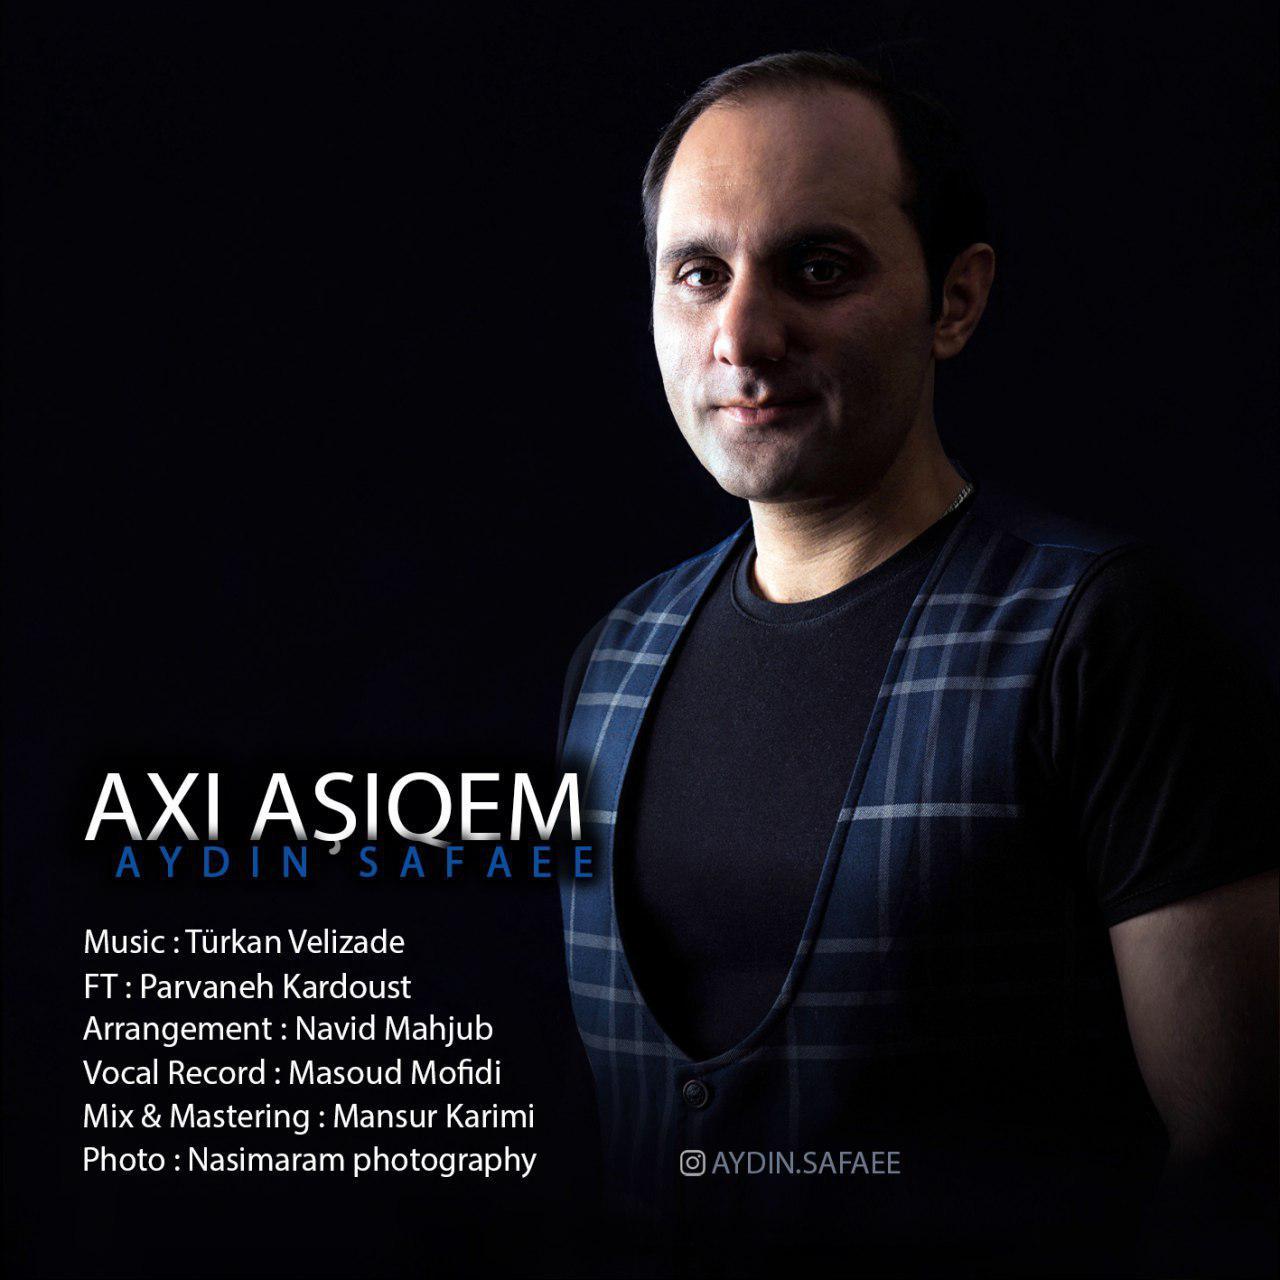 http://birtunes.ir/wp-content/uploads/2018/11/Aydin-Safaee-Axi-Ashiqem.jpg